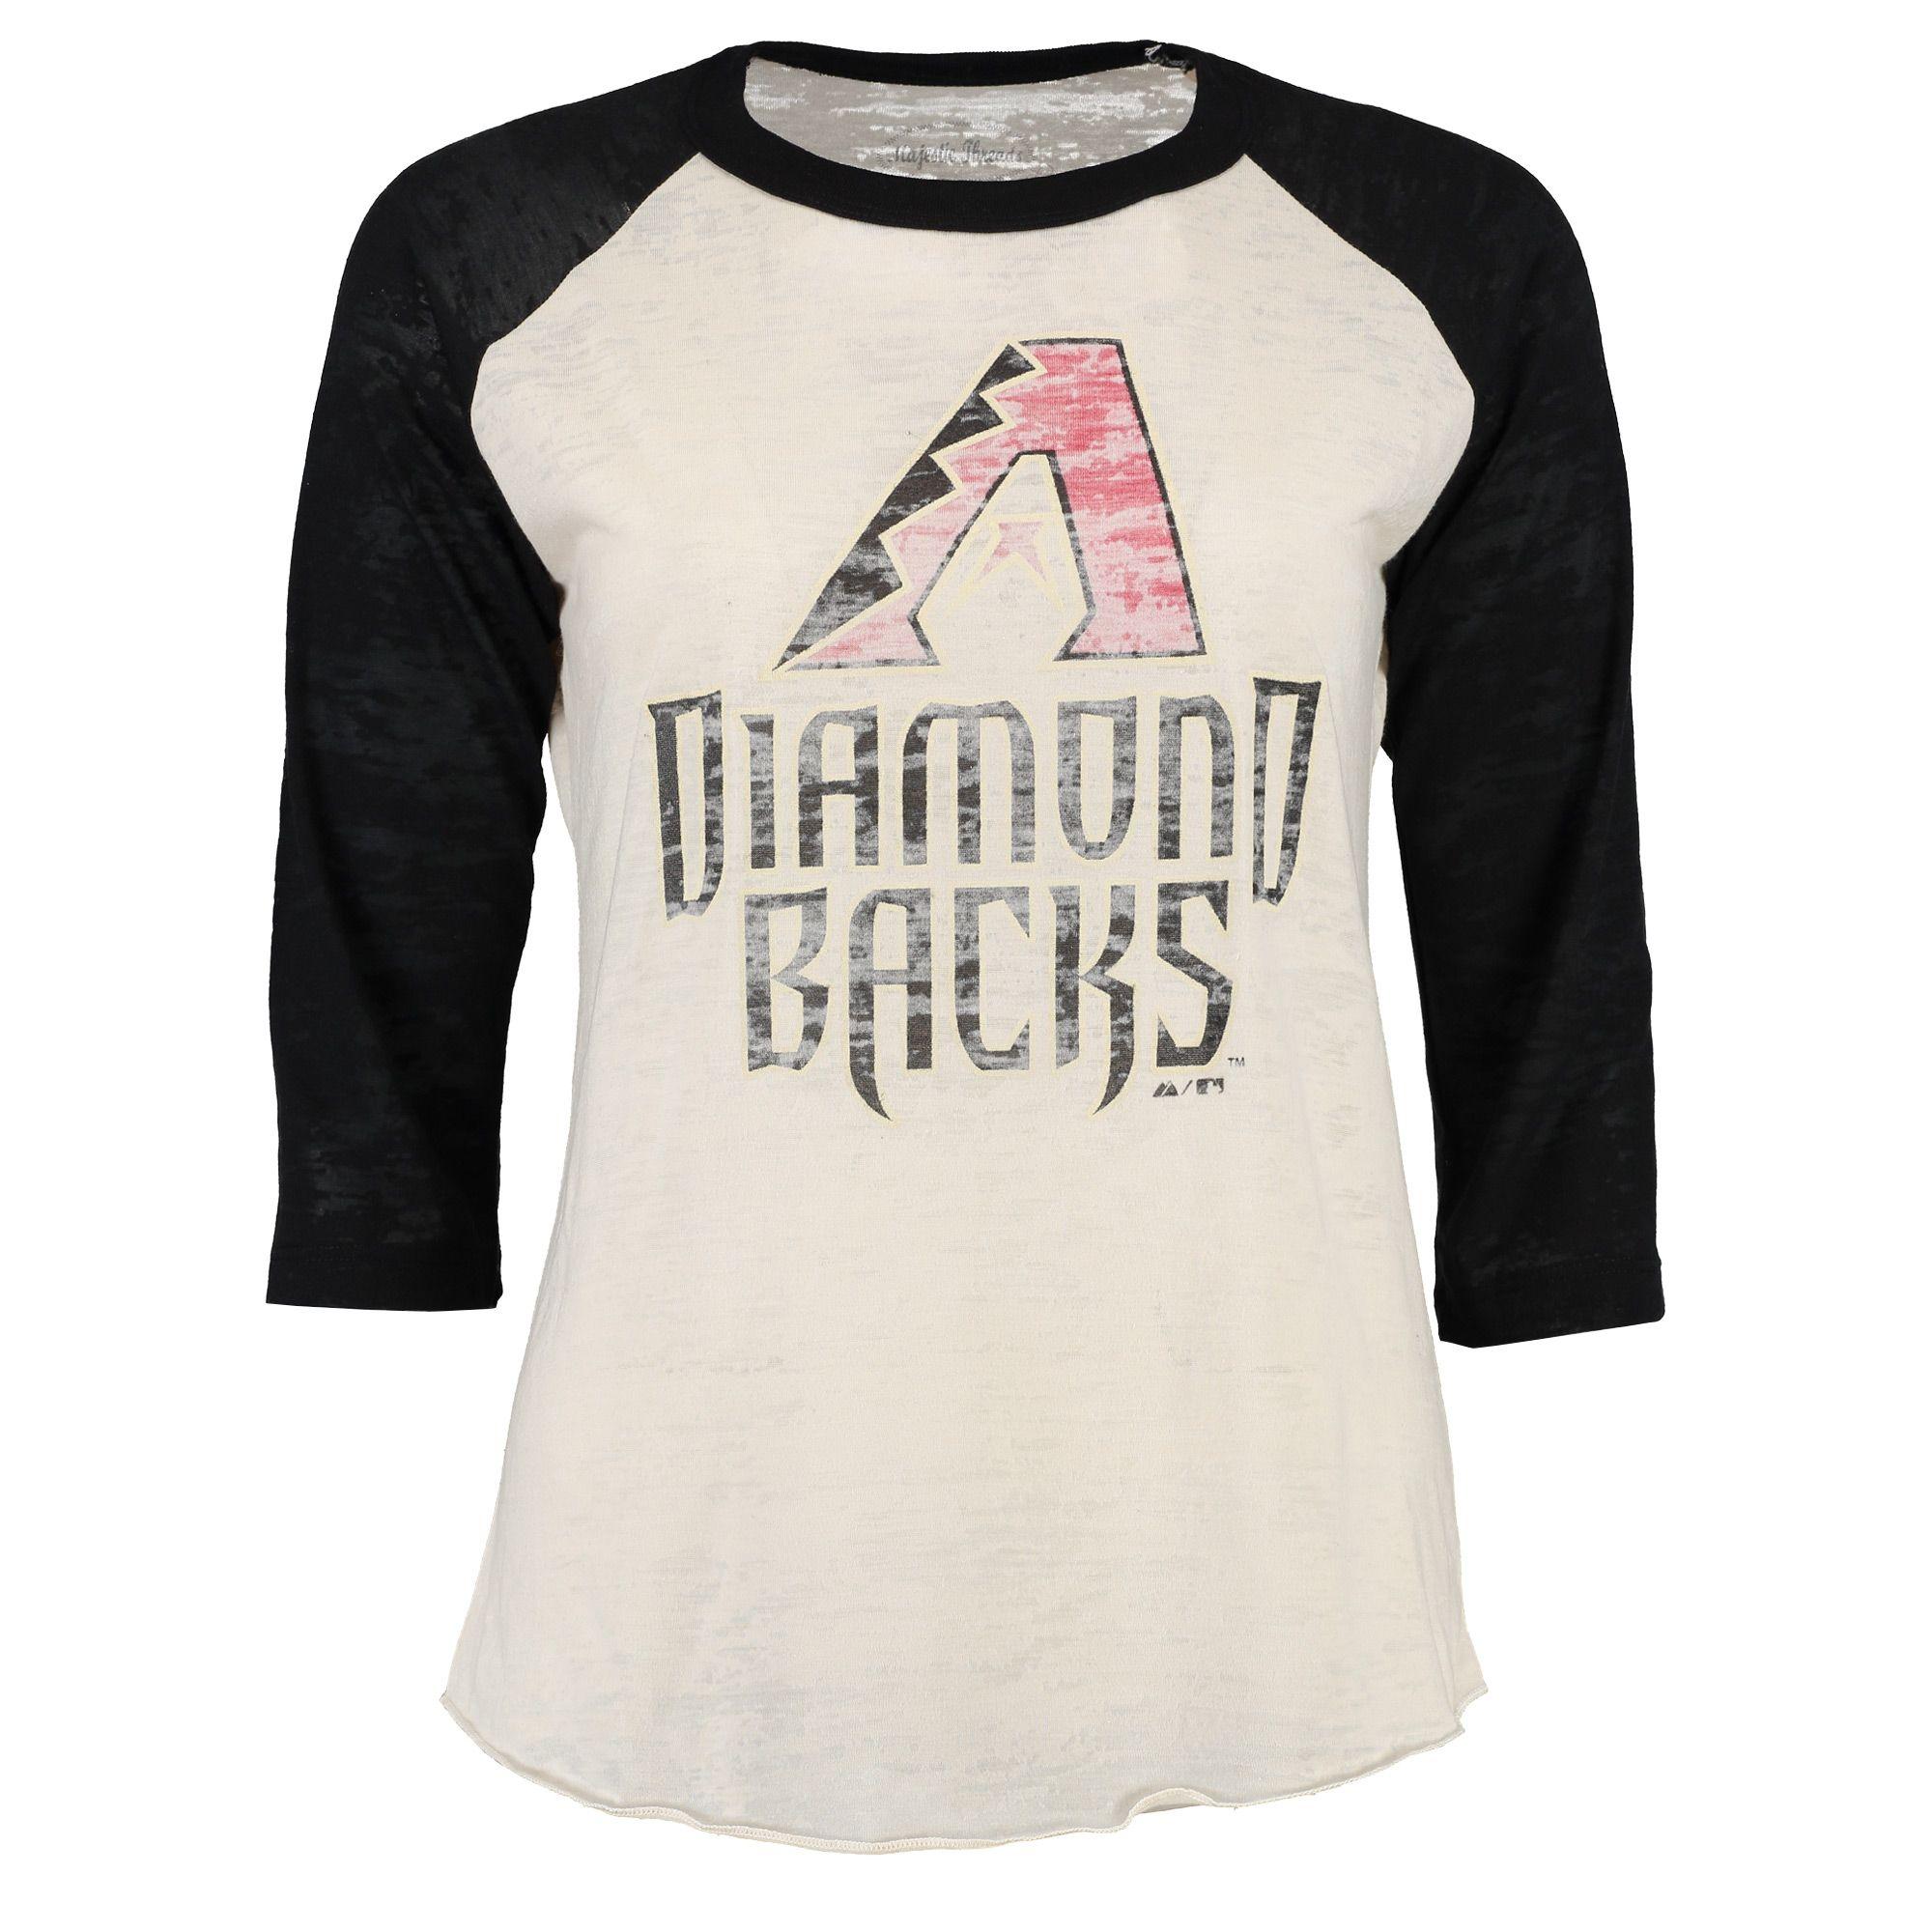 4a40f6097 MLB Arizona Diamondbacks Majestic Threads Women's Burnout Raglan Long  Sleeve T-Shirt - White/Black